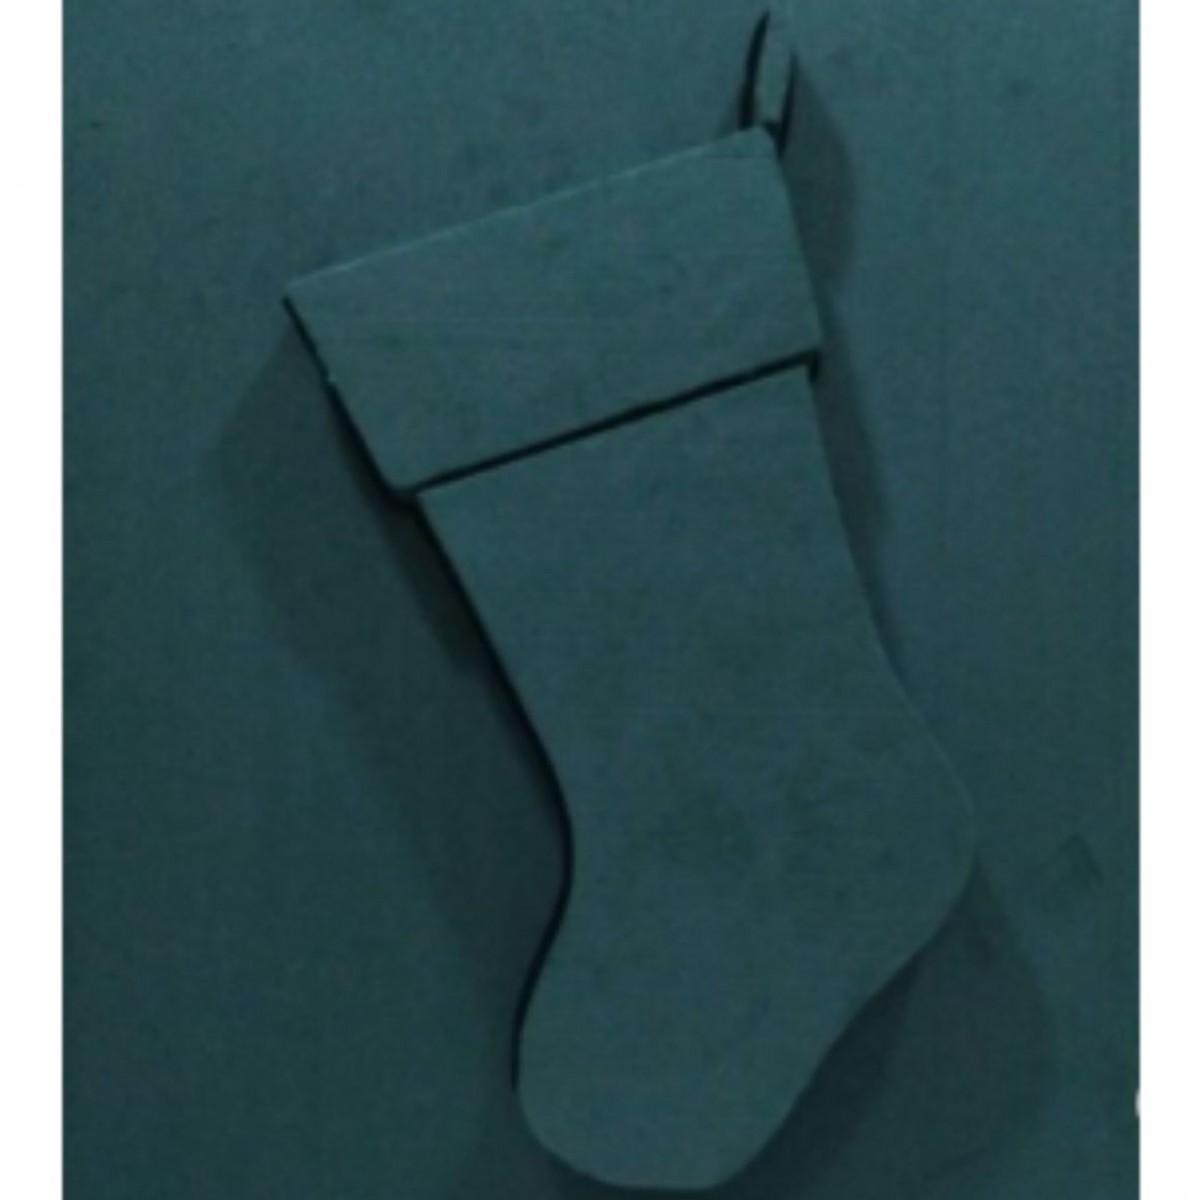 Santa Stocking (1 No) 24